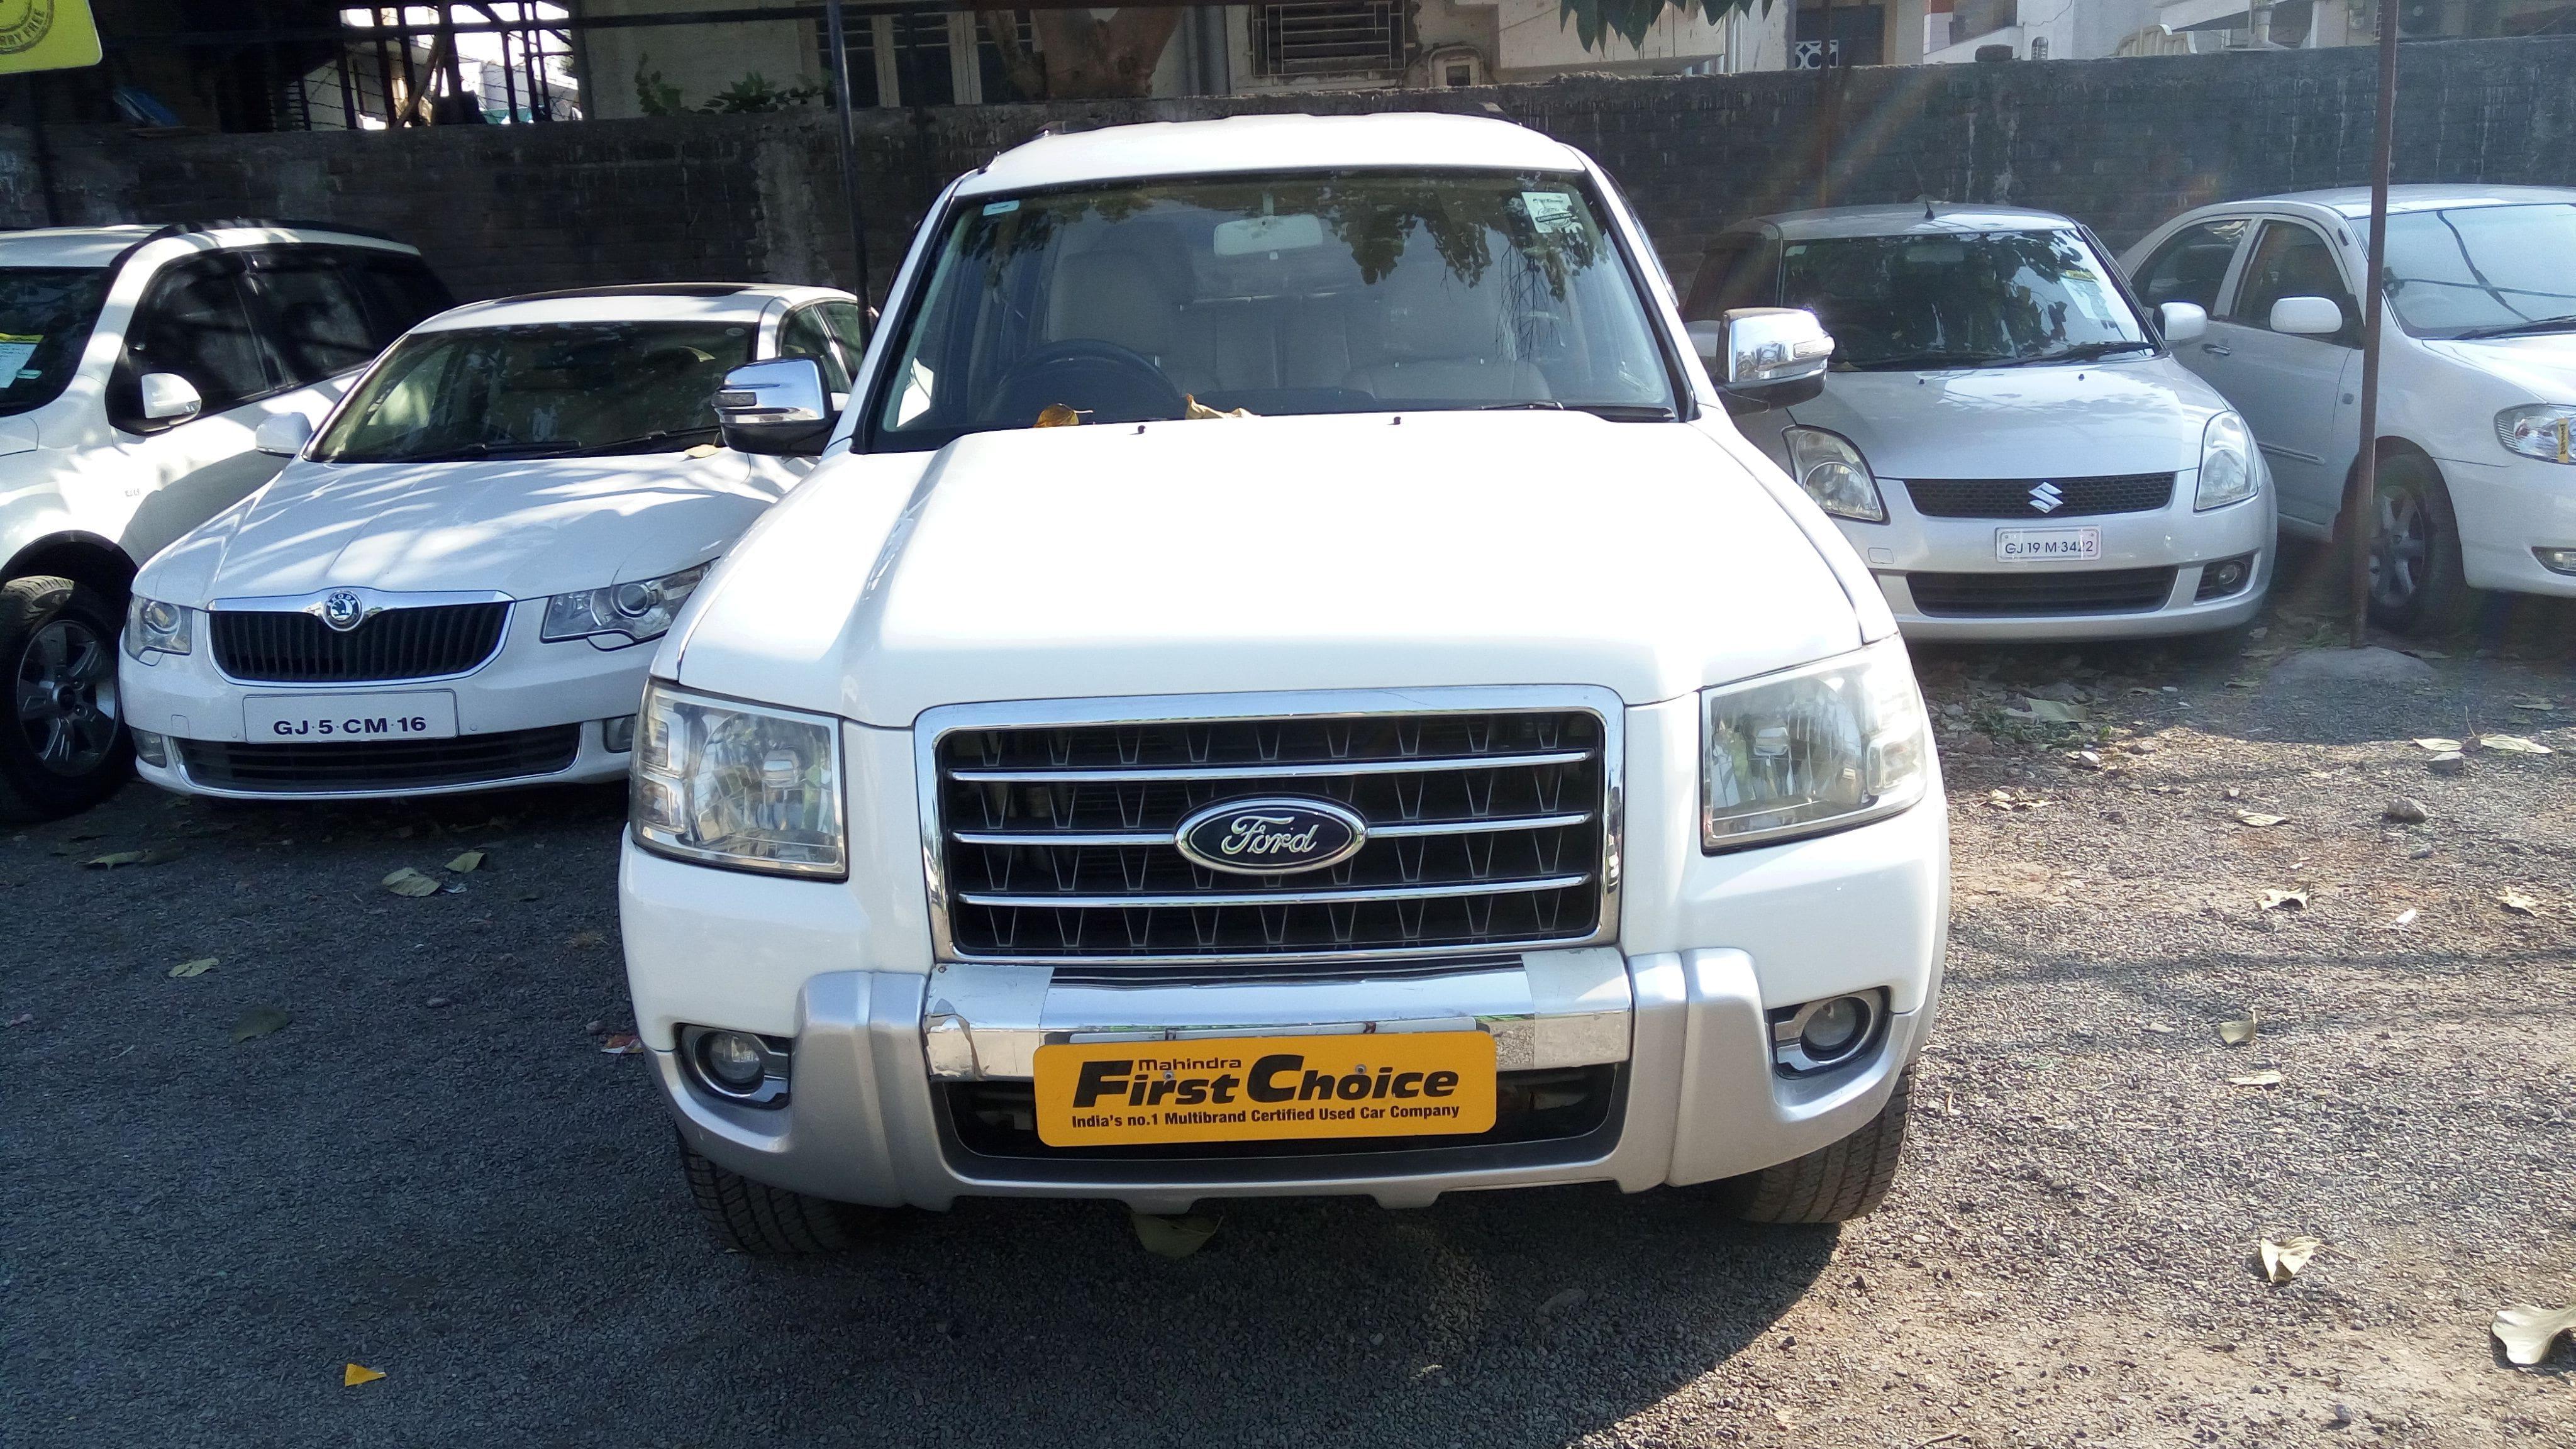 Ford Endeavour 2009-2014 2.5L 4X2 & Used Ford Endeavour 2009 2014 25L 4X2 1269825 markmcfarlin.com